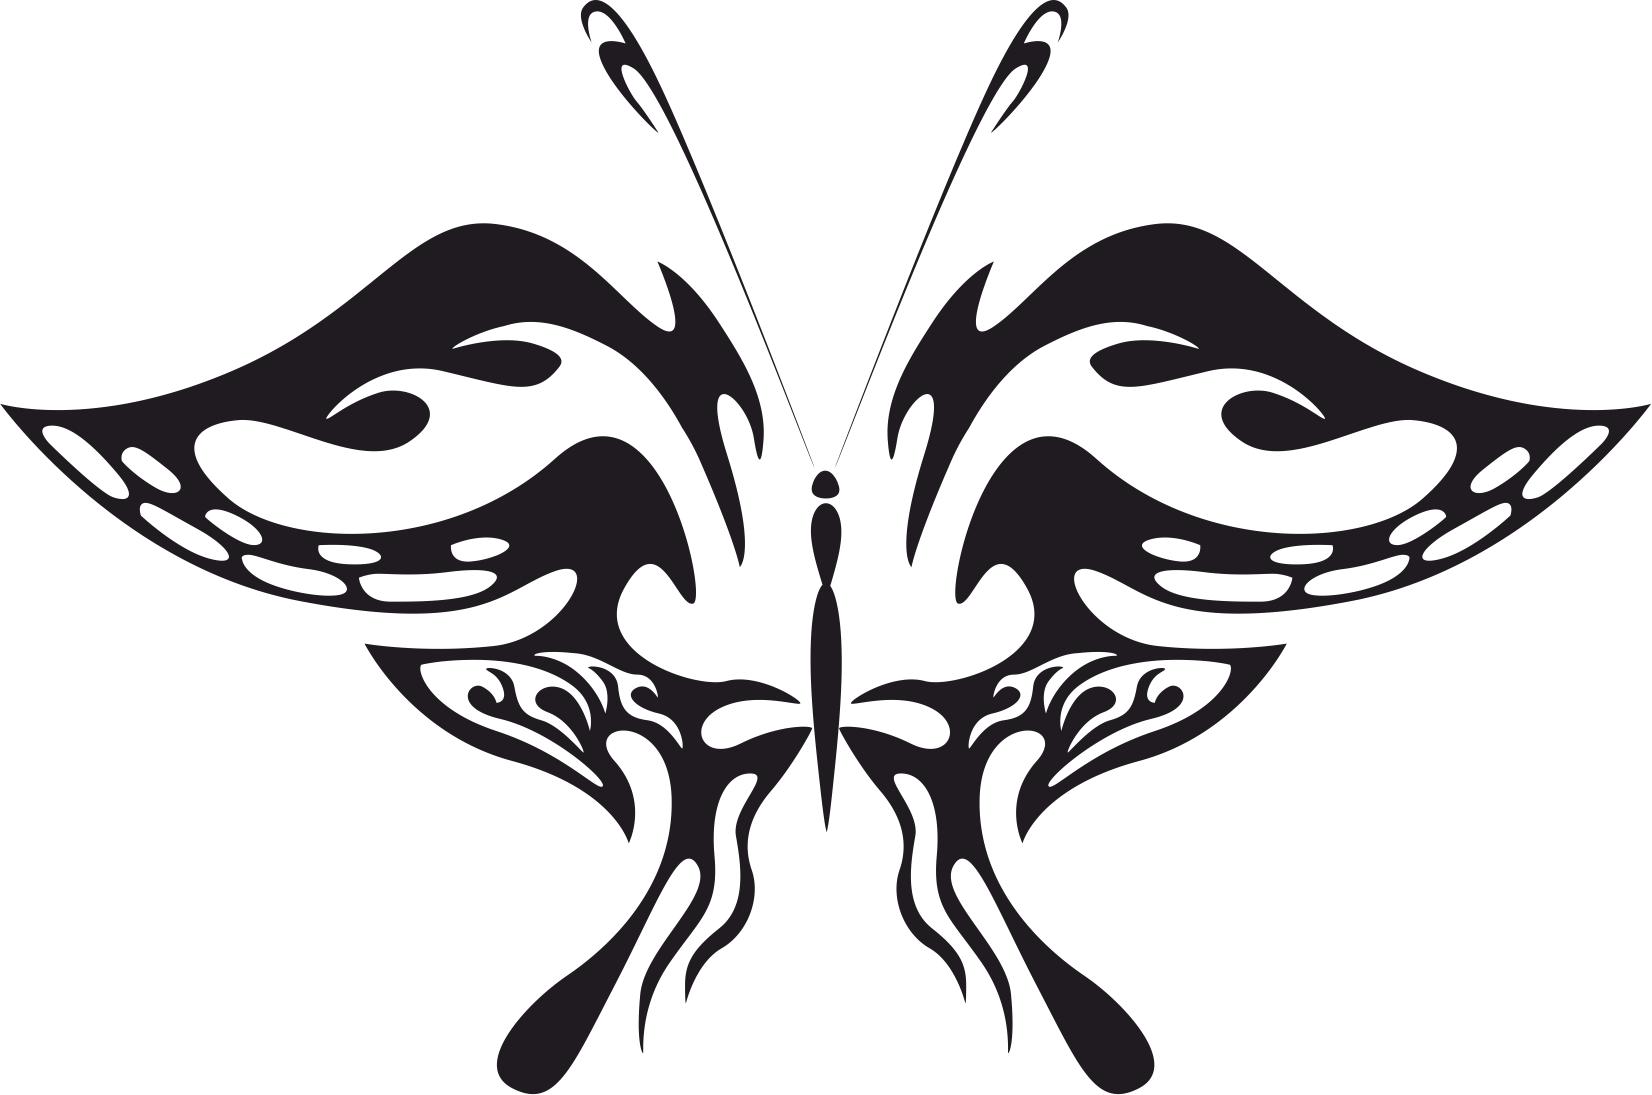 Butterfly Silhouette Shape Free CDR Vectors Art